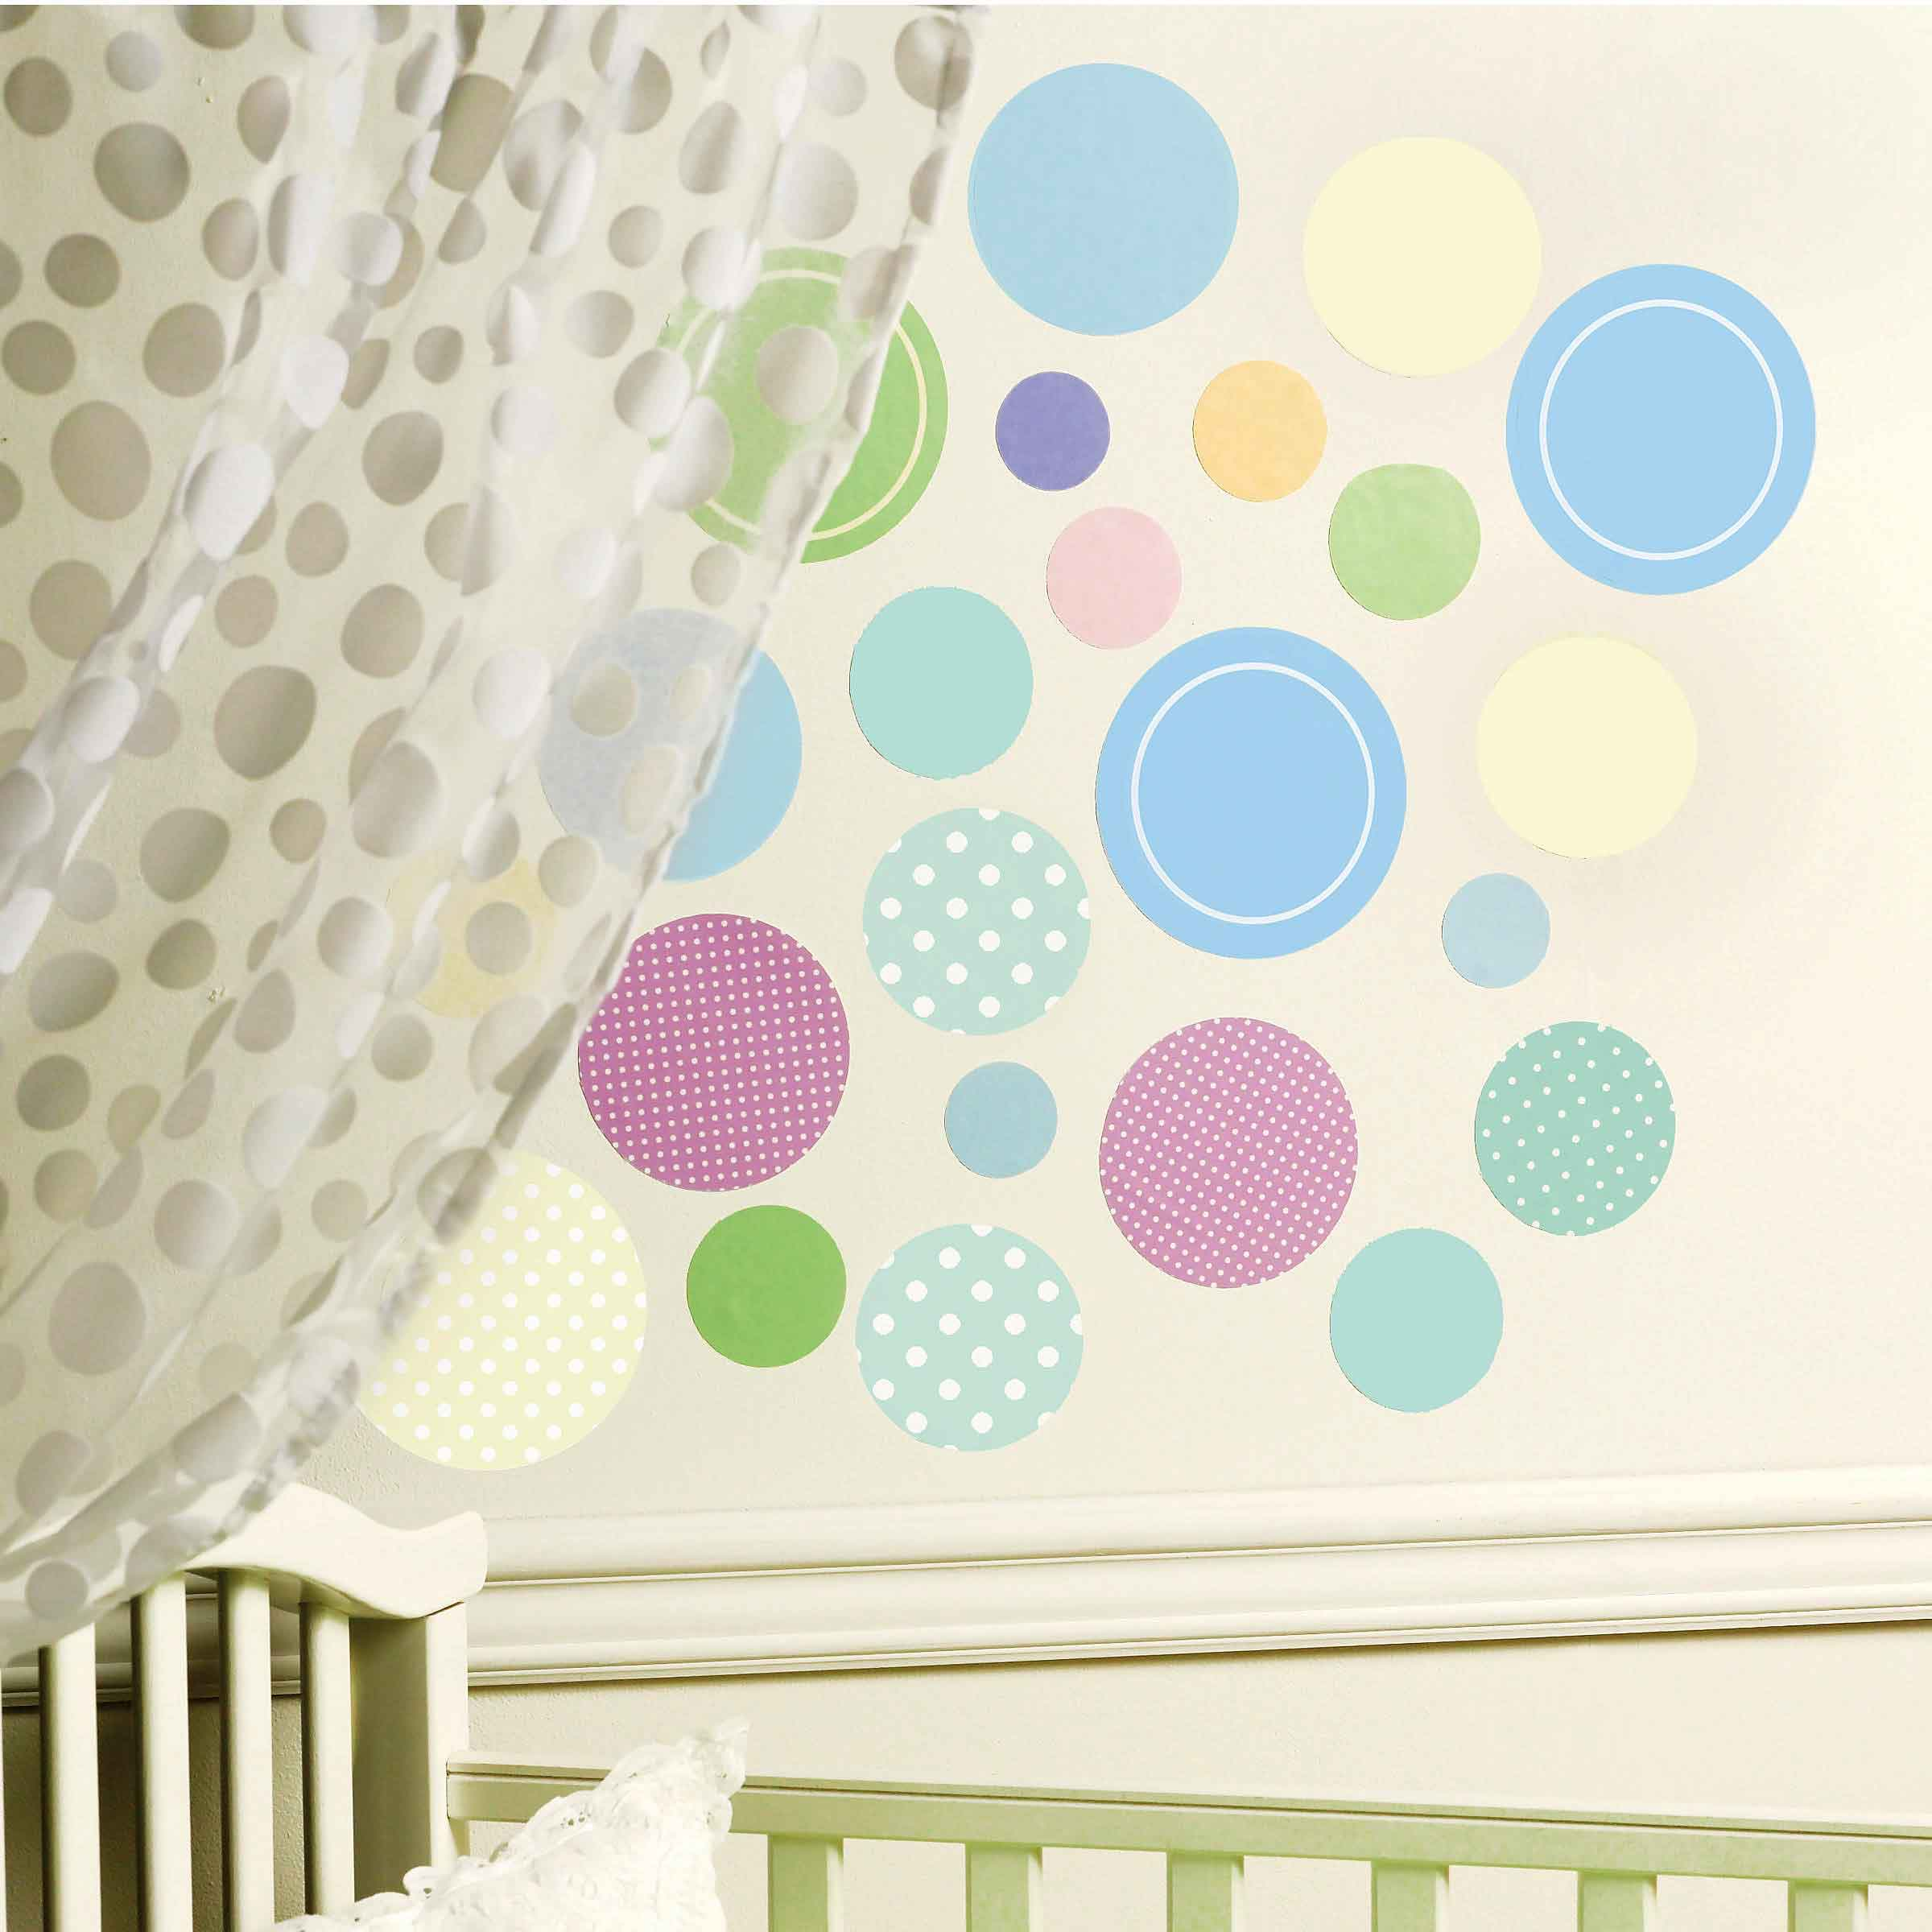 wallies wandsticker wandaufkleber wandtattoo baby bunte punkte www 4. Black Bedroom Furniture Sets. Home Design Ideas